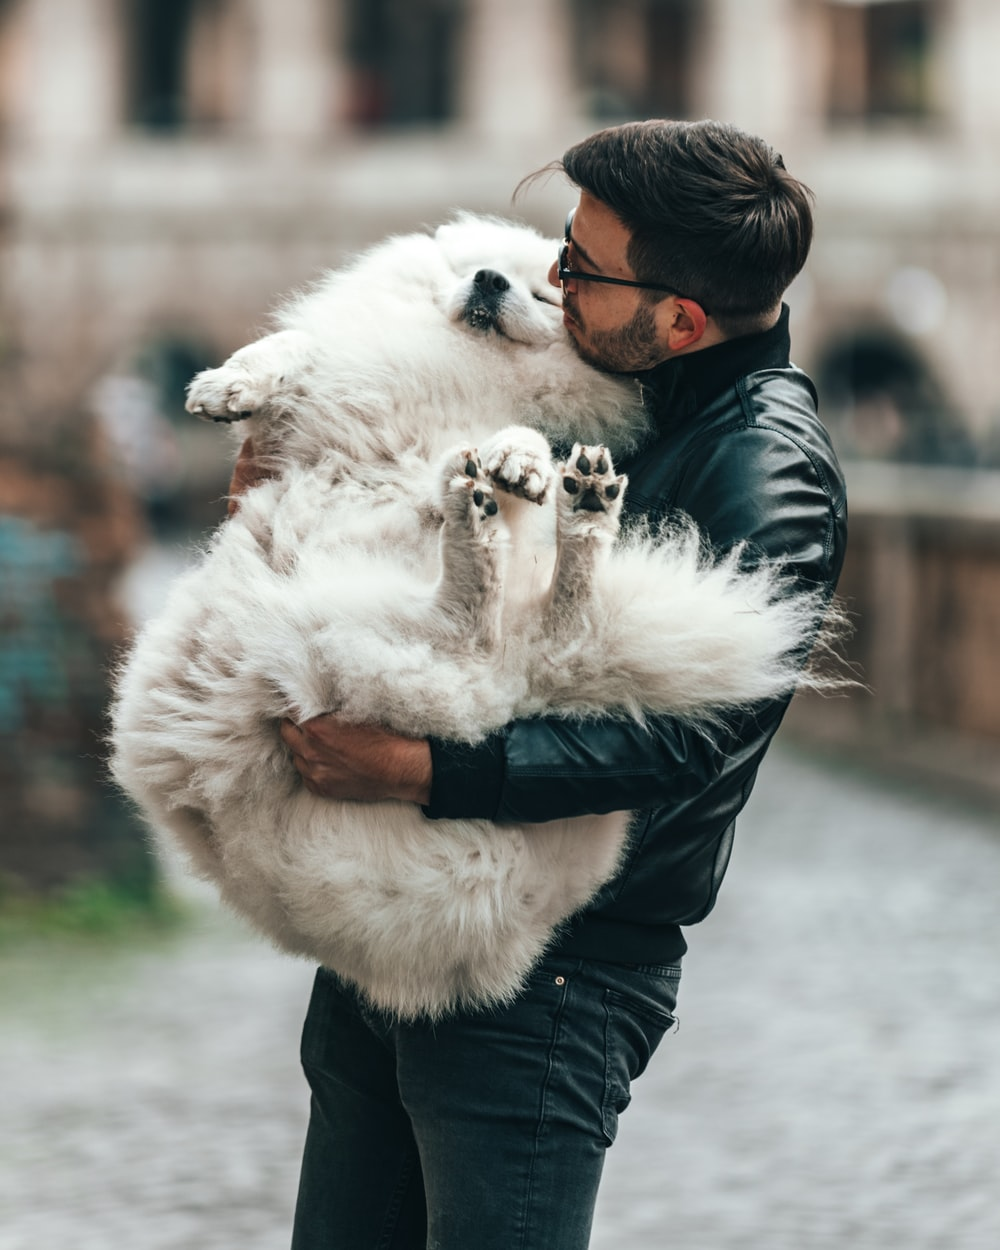 man in eyeglasses and black jacket carrying white dog